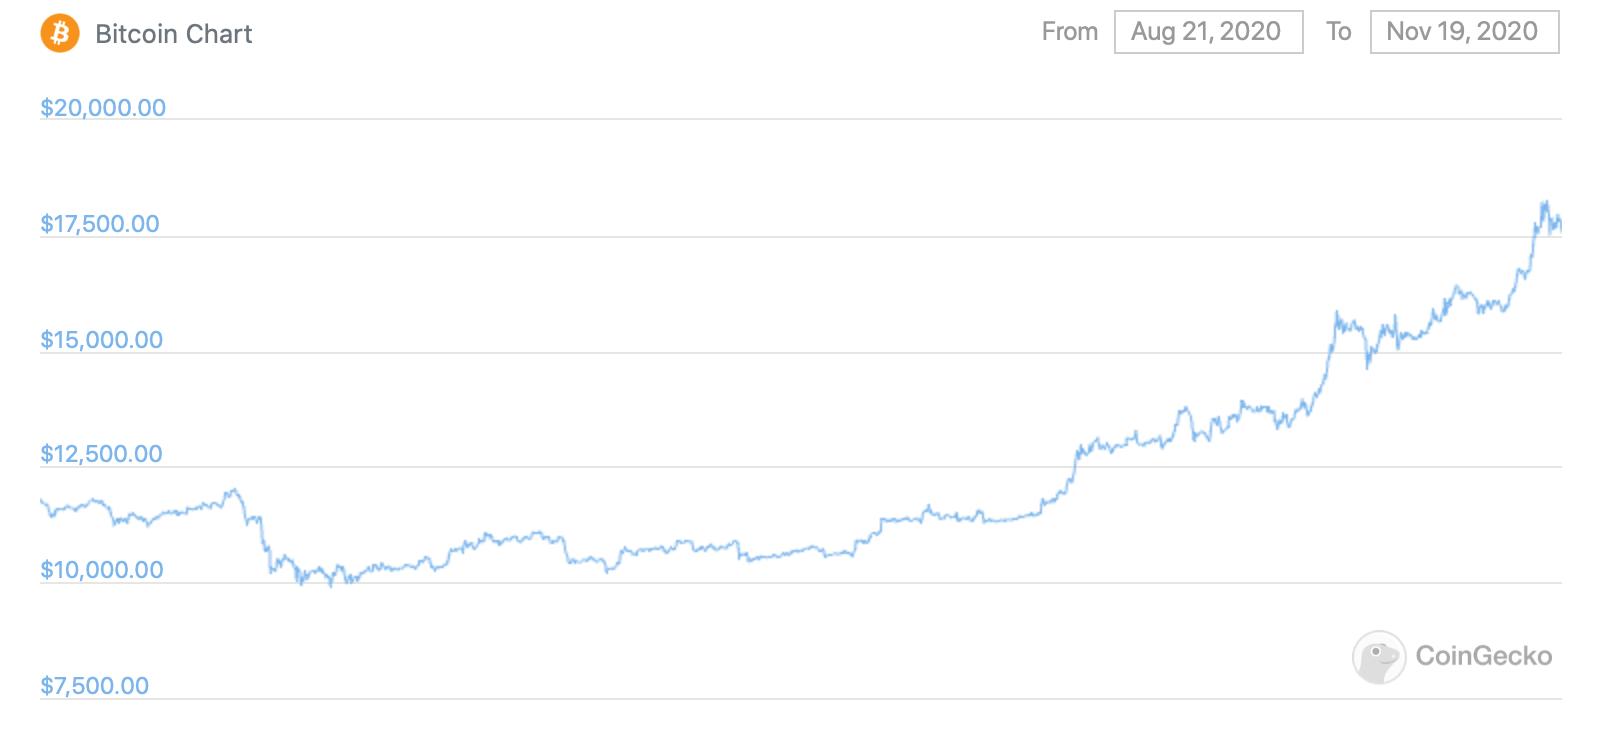 График Биткоина за три месяца